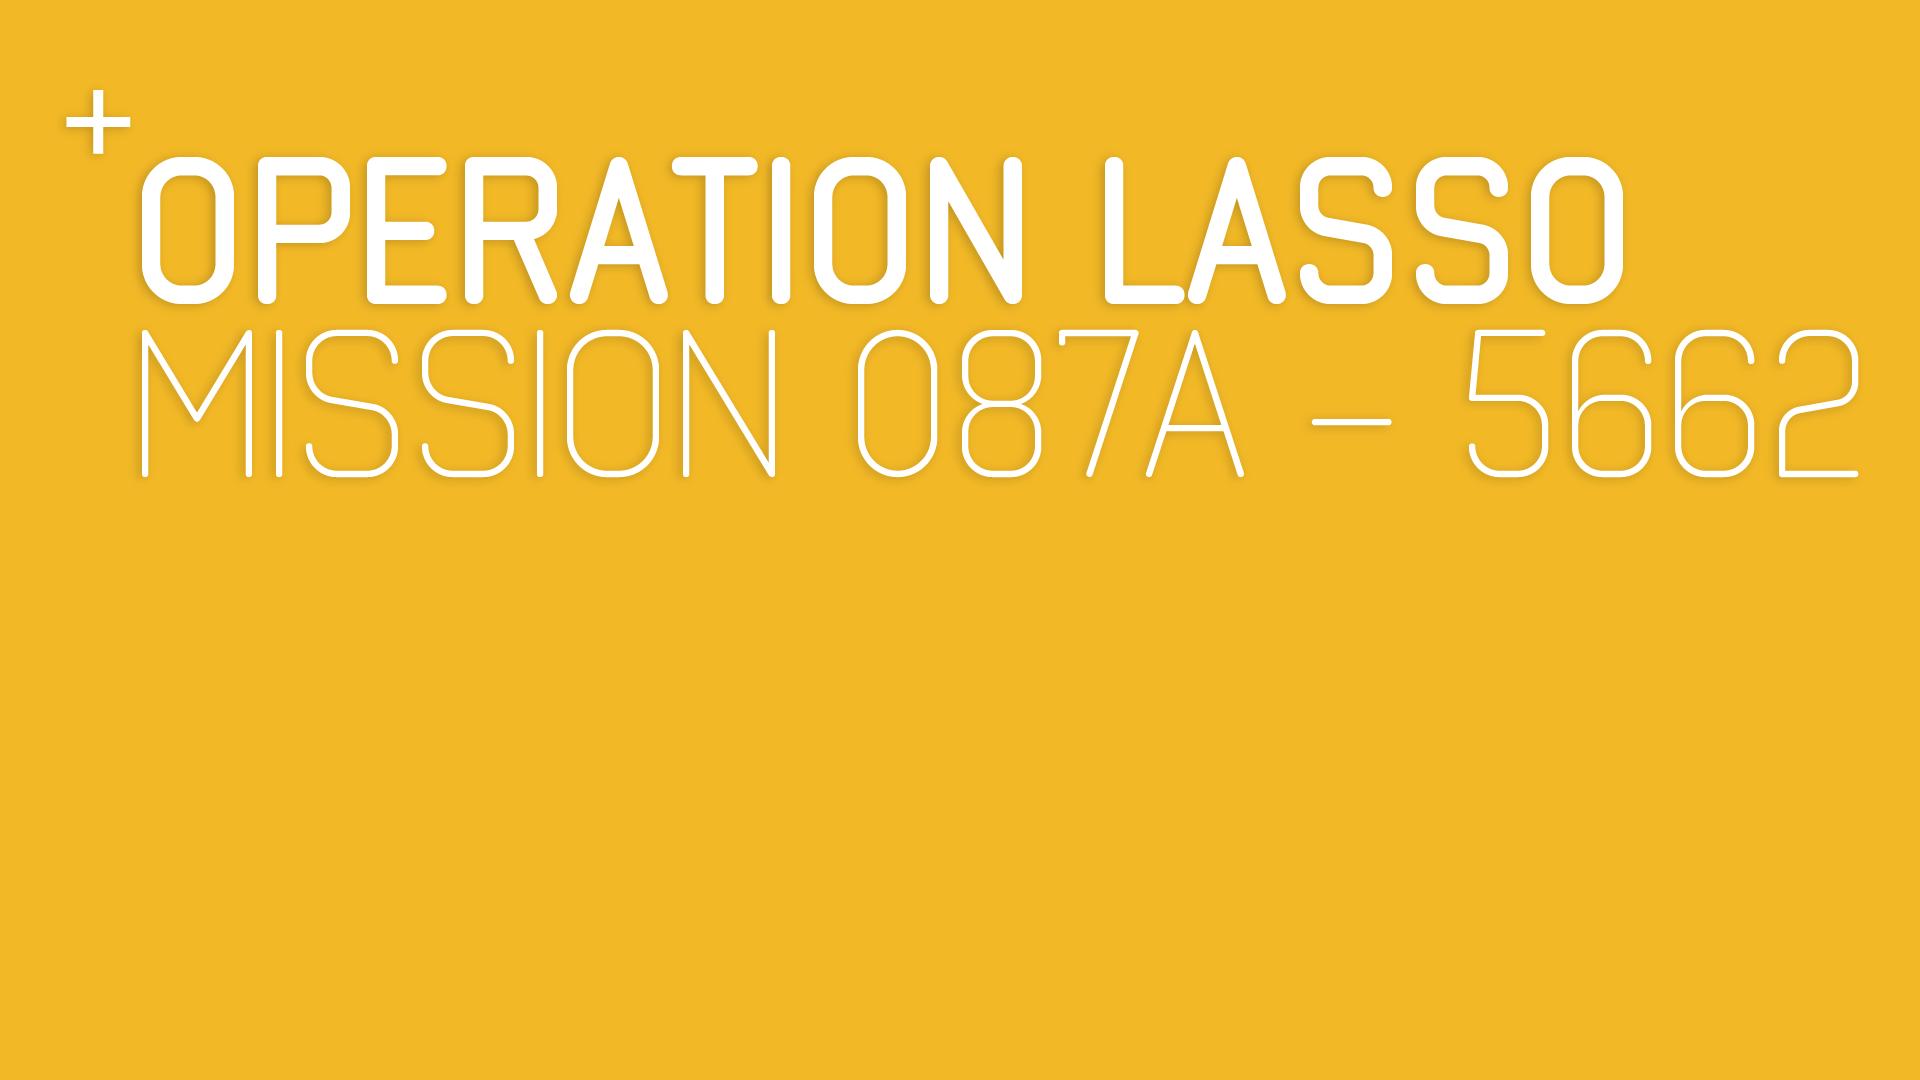 The_corporation_missionbrief_c8_v02_3-01.png